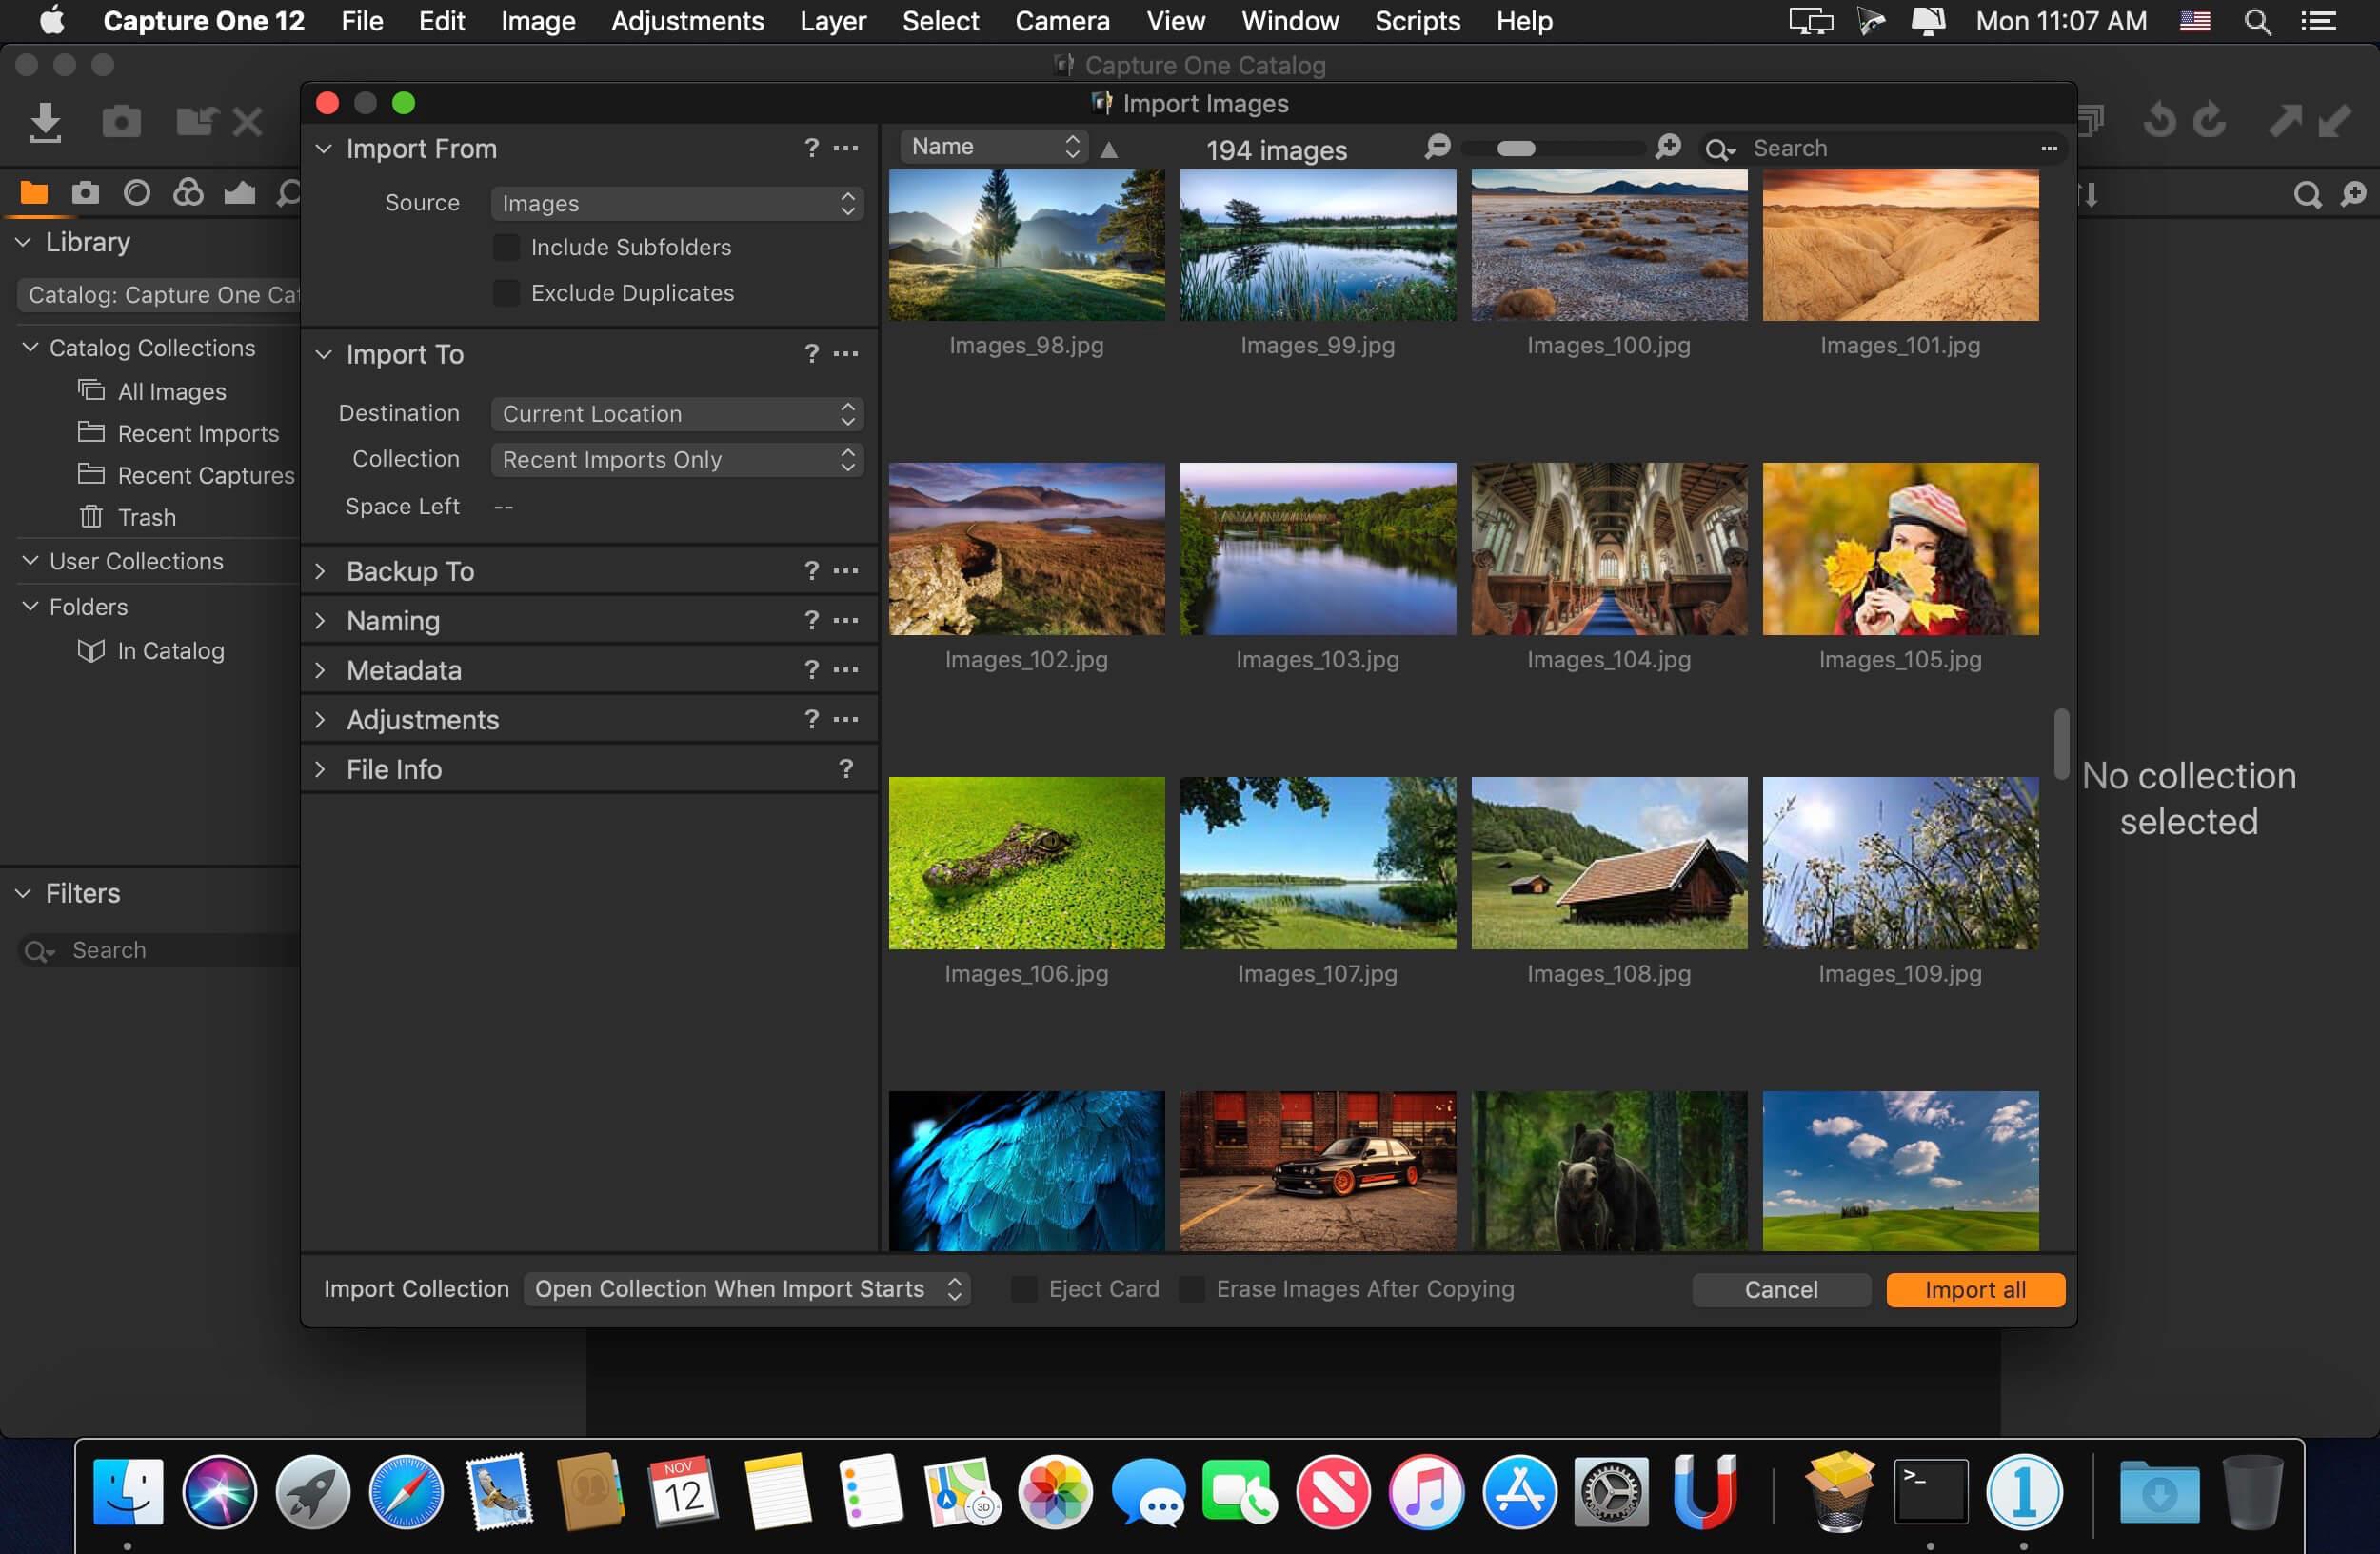 Capture One Pro 12 1 2 38 download | macOS